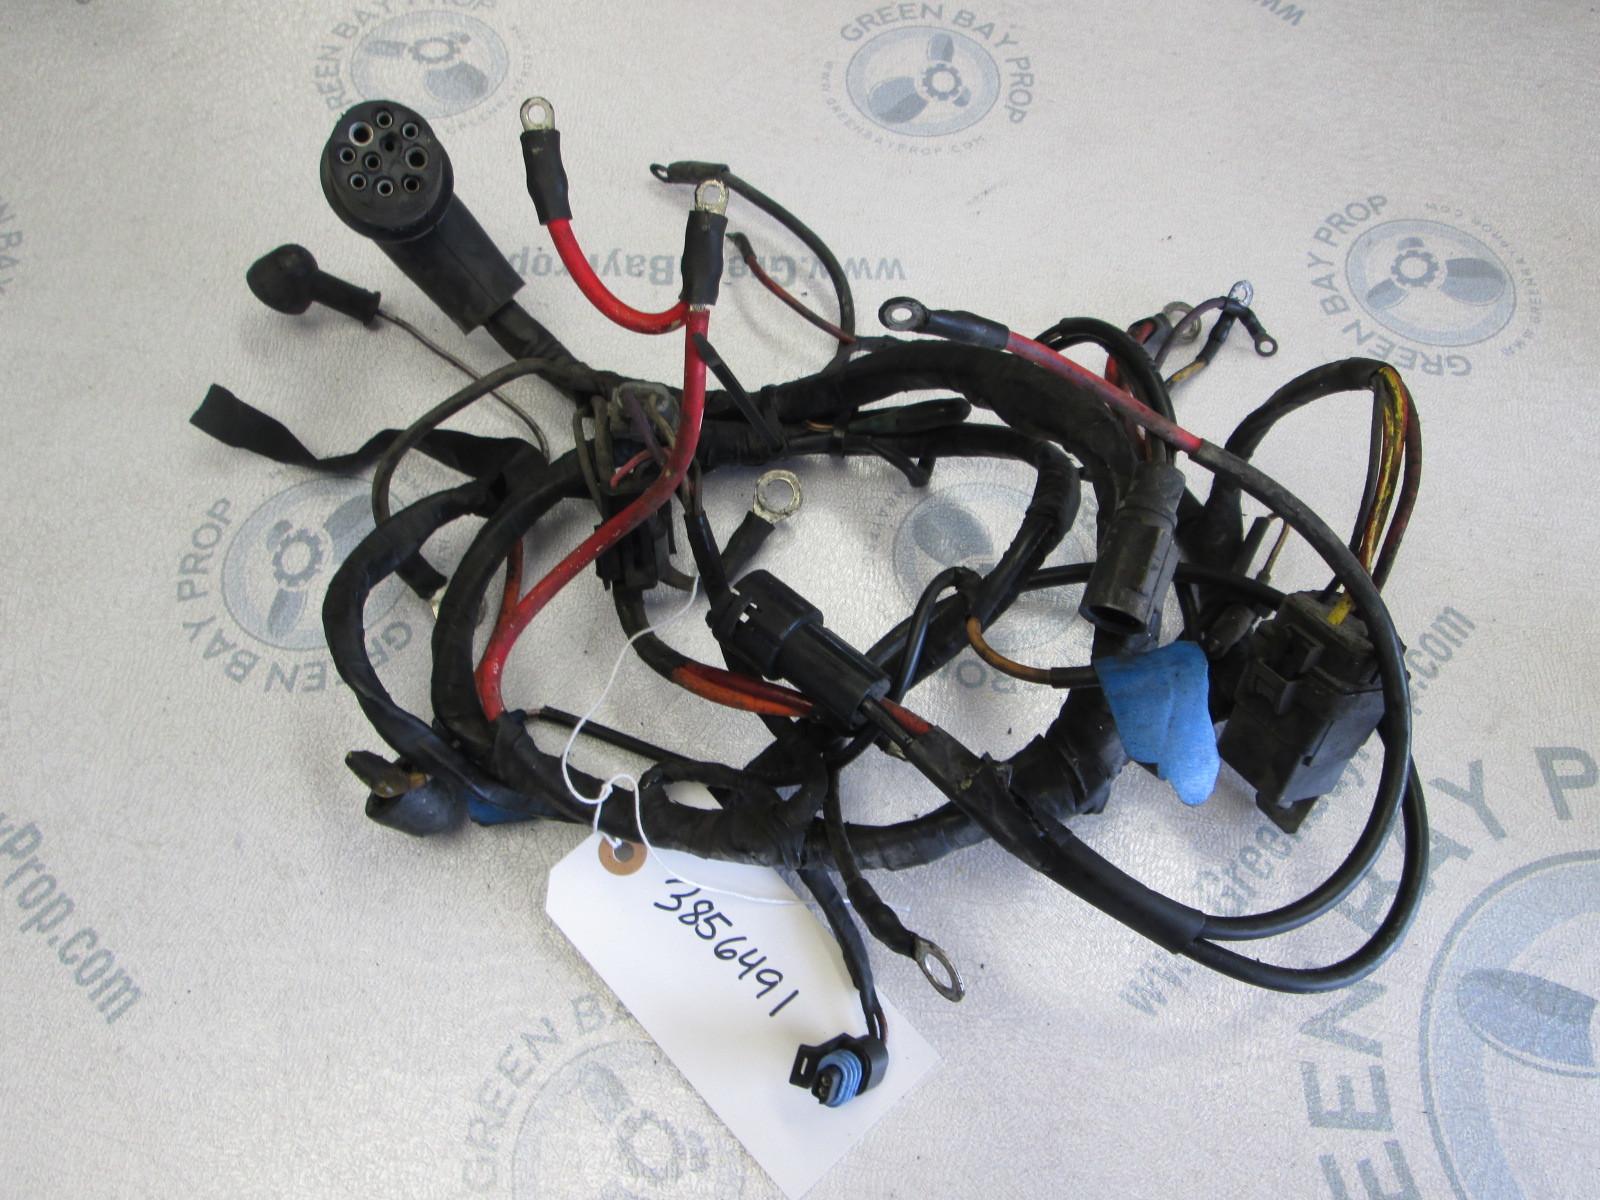 3856491 Volvo Penta SX & OMC Cobra 3.0 4 Cyl Stern Drive Engine Wire Harness  | Green Bay Propeller & Marine LLCGreen Bay Prop